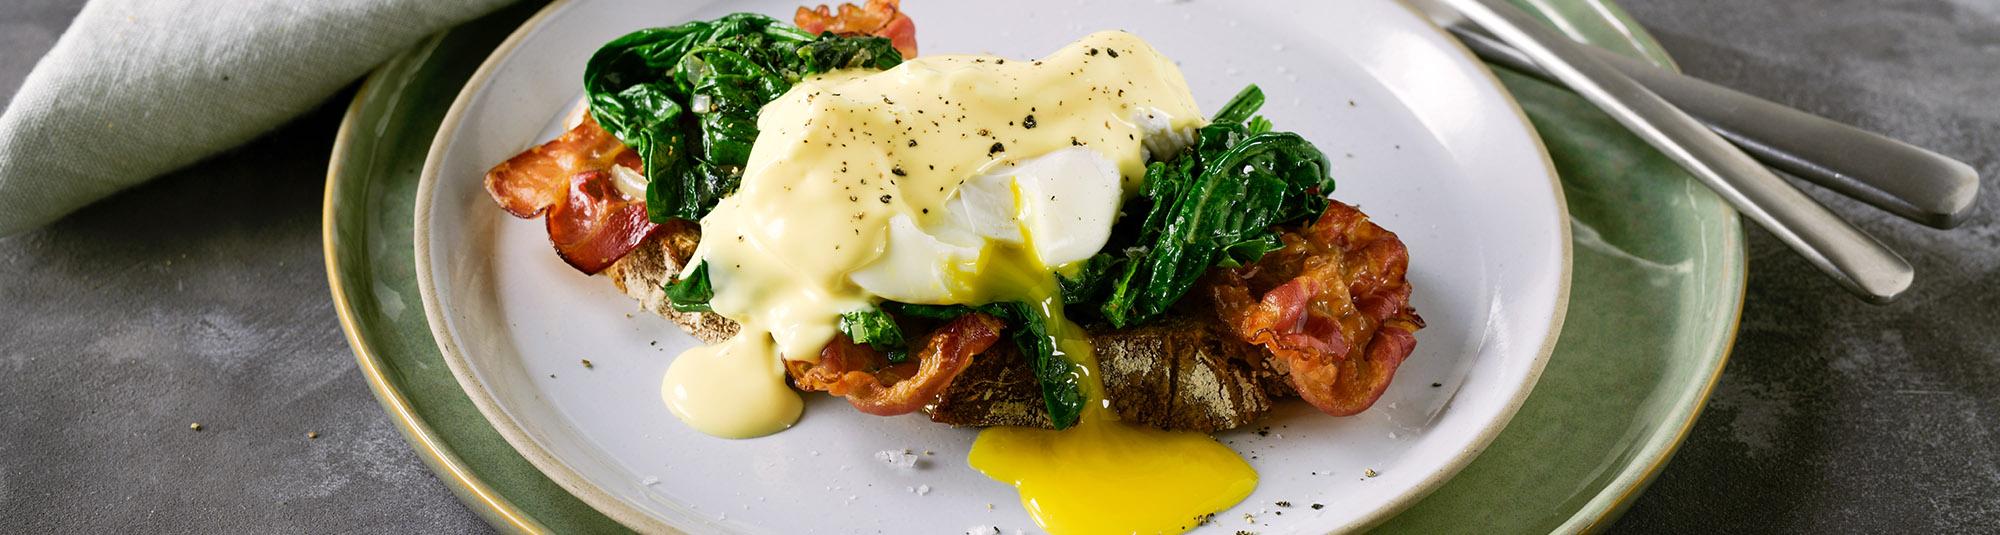 veg eggs benedict